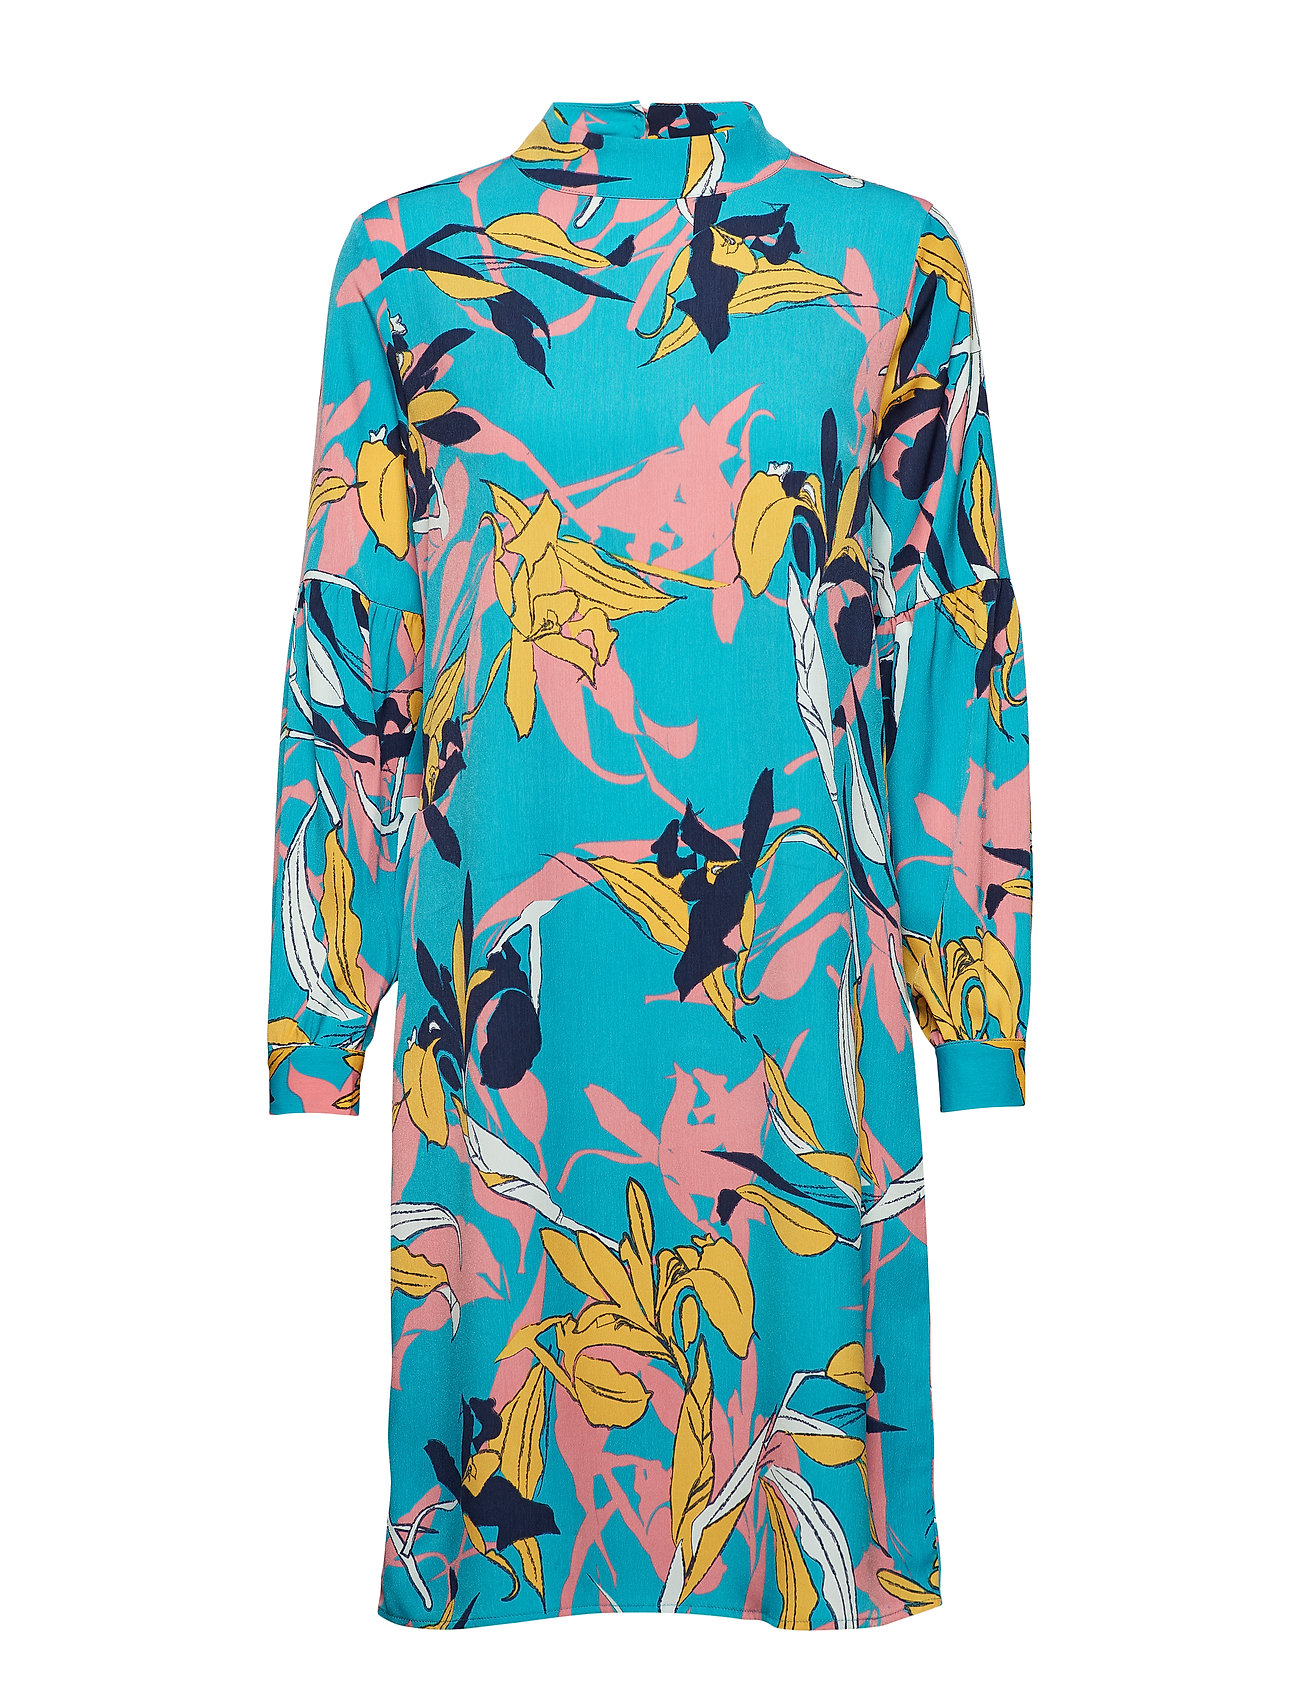 Minus Caitlyn dress - AQUA BLUE TWISTED FLOWER PRINT